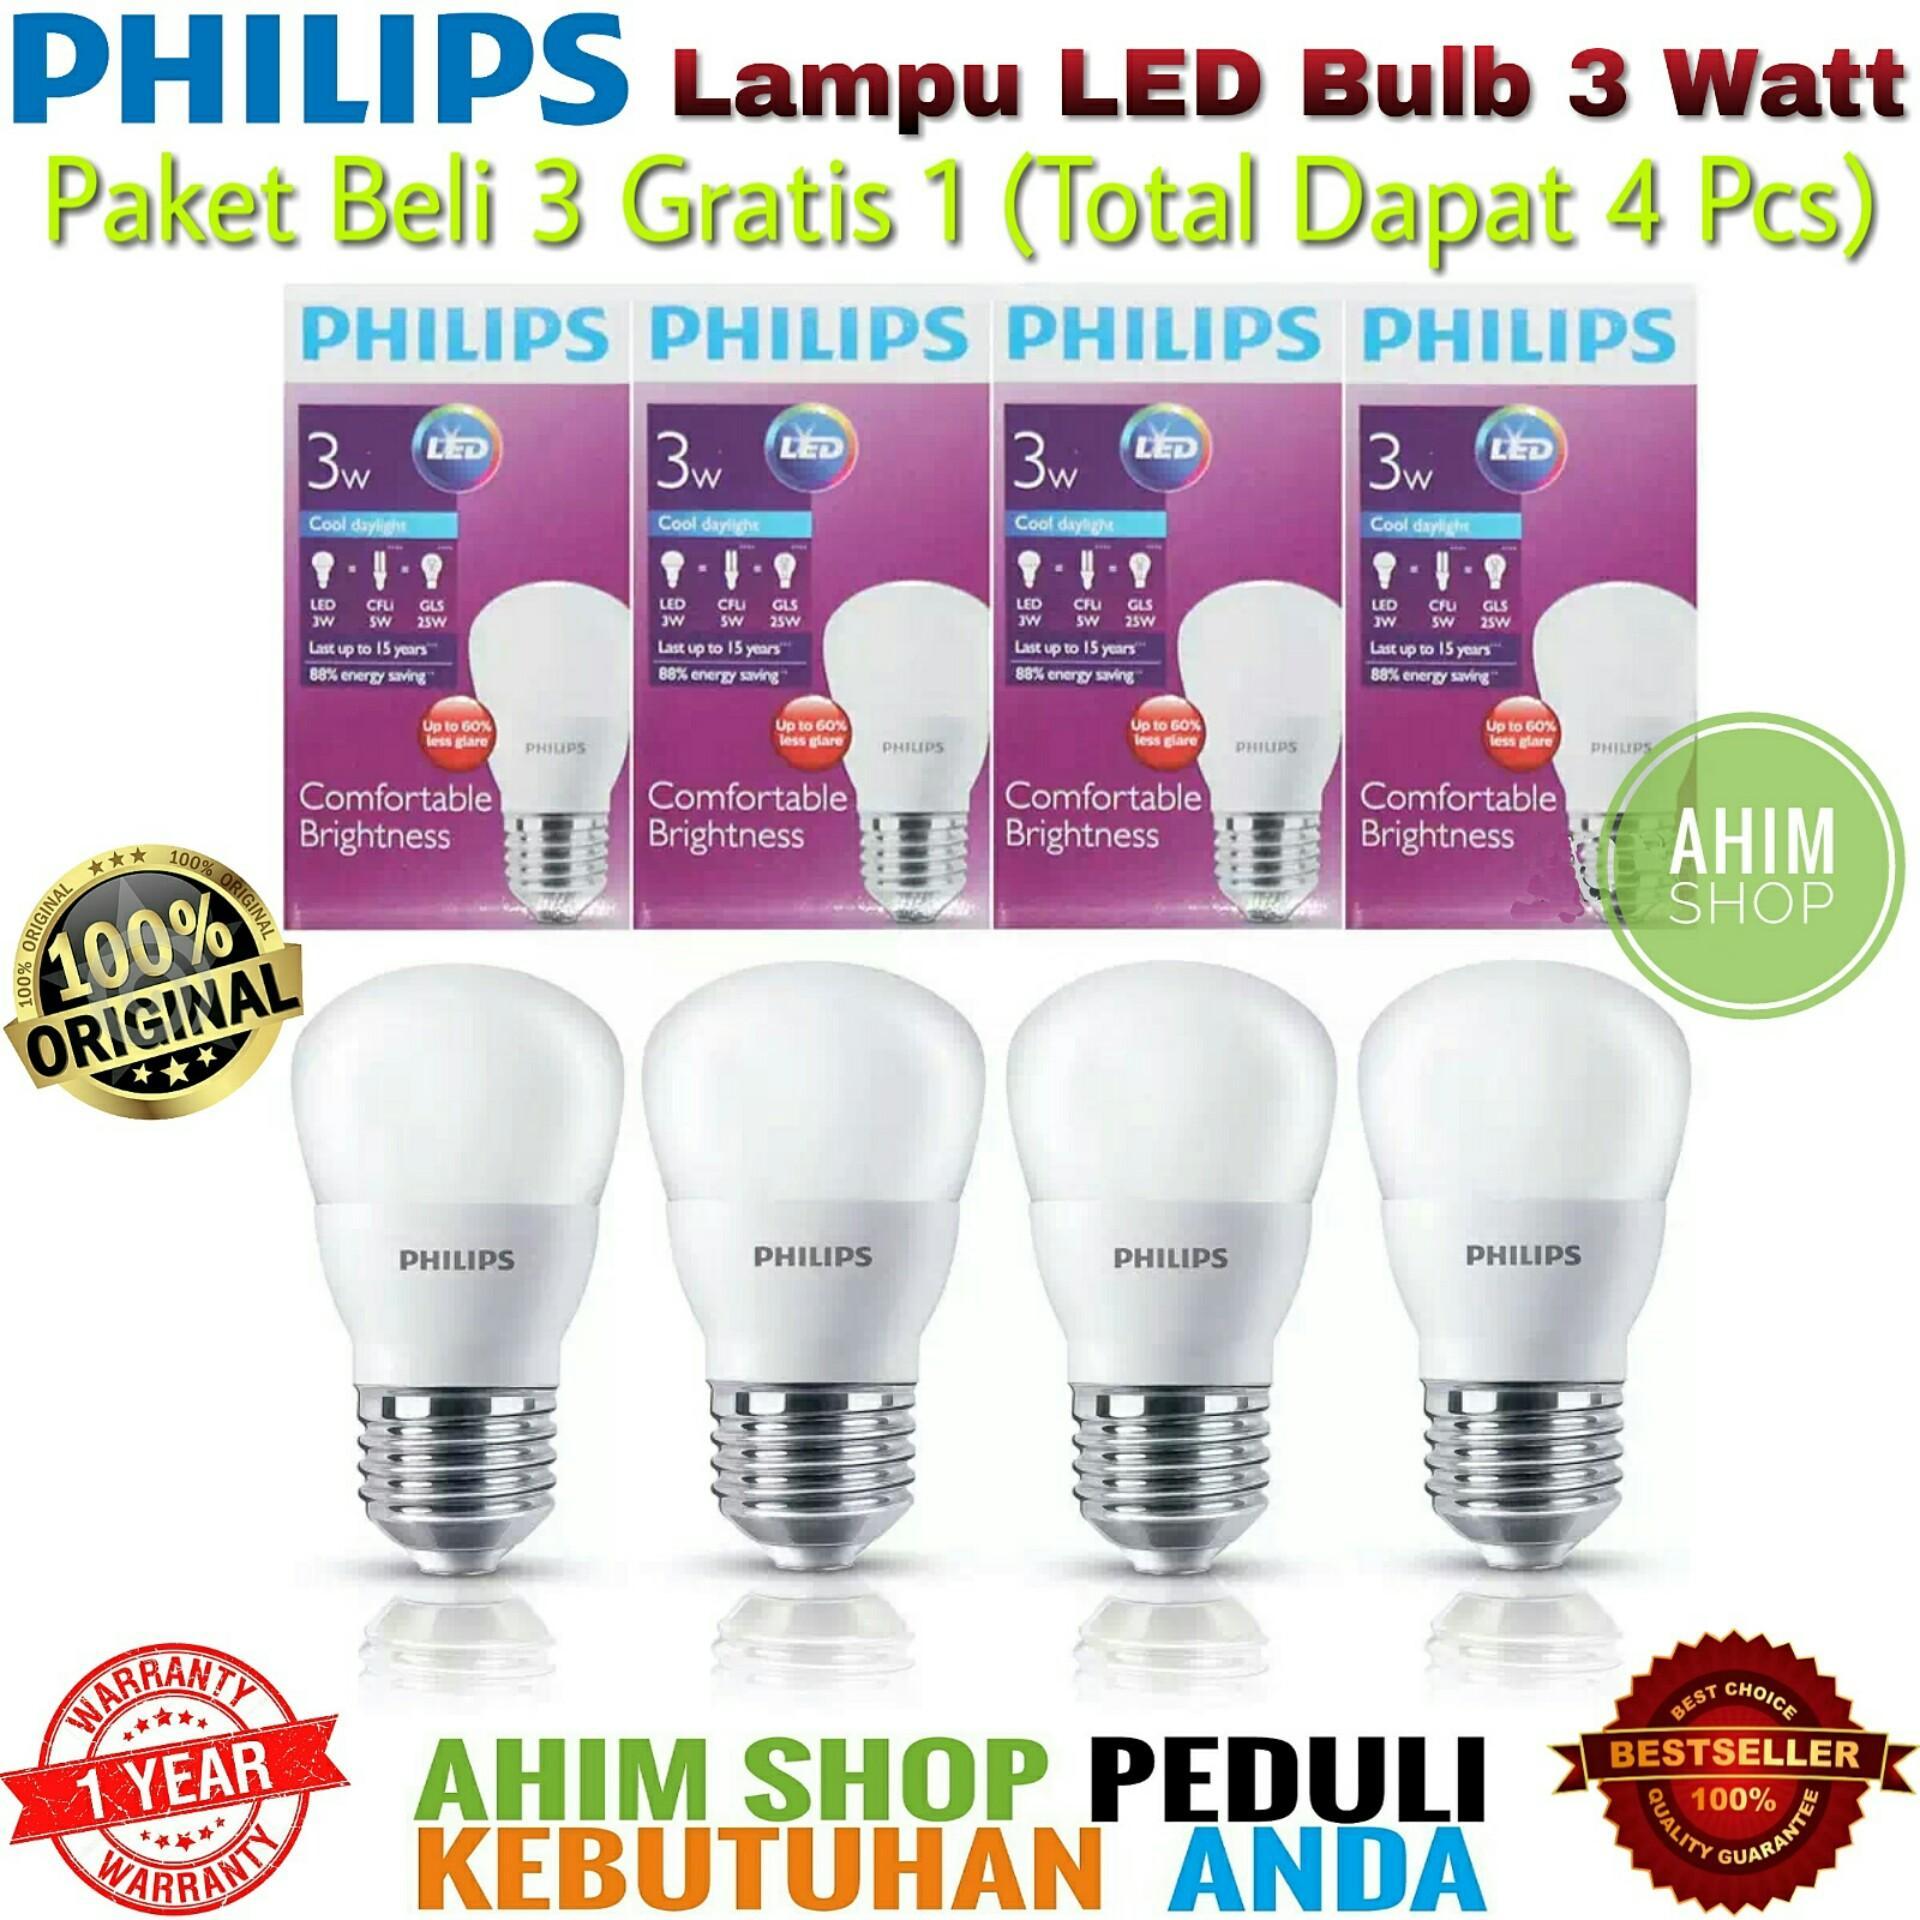 PHILIPS Lampu Led Bulb 3 Watt 3W 3Wat 3 W Putih Paket 4 Pcs - Cool Daylight (Putih)